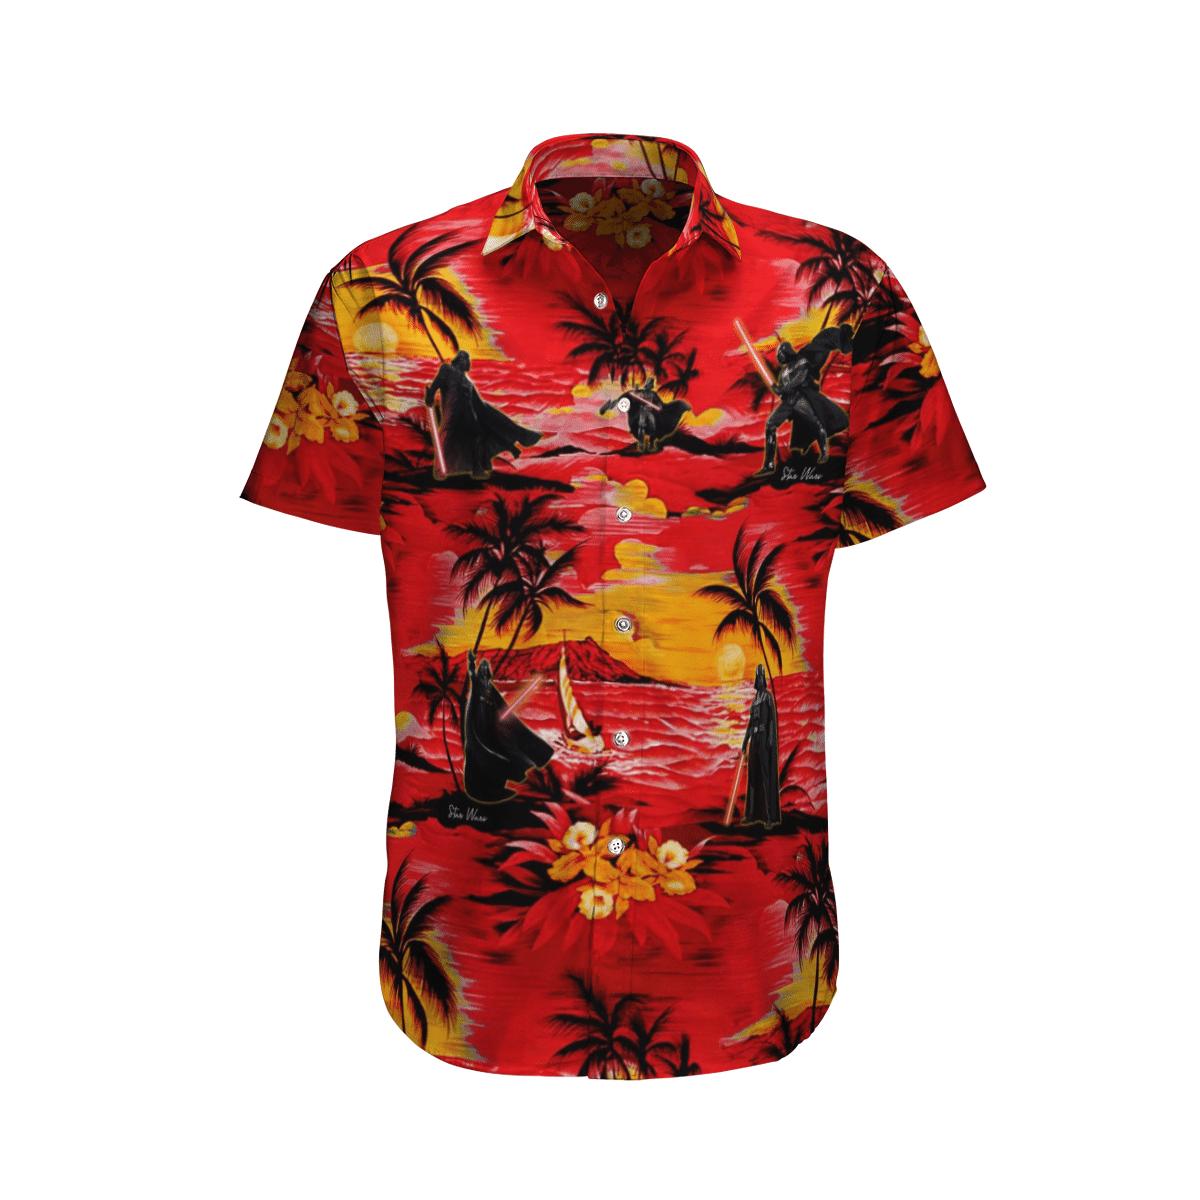 Star wars Darth Vader Sunset Hawaiian Shirt